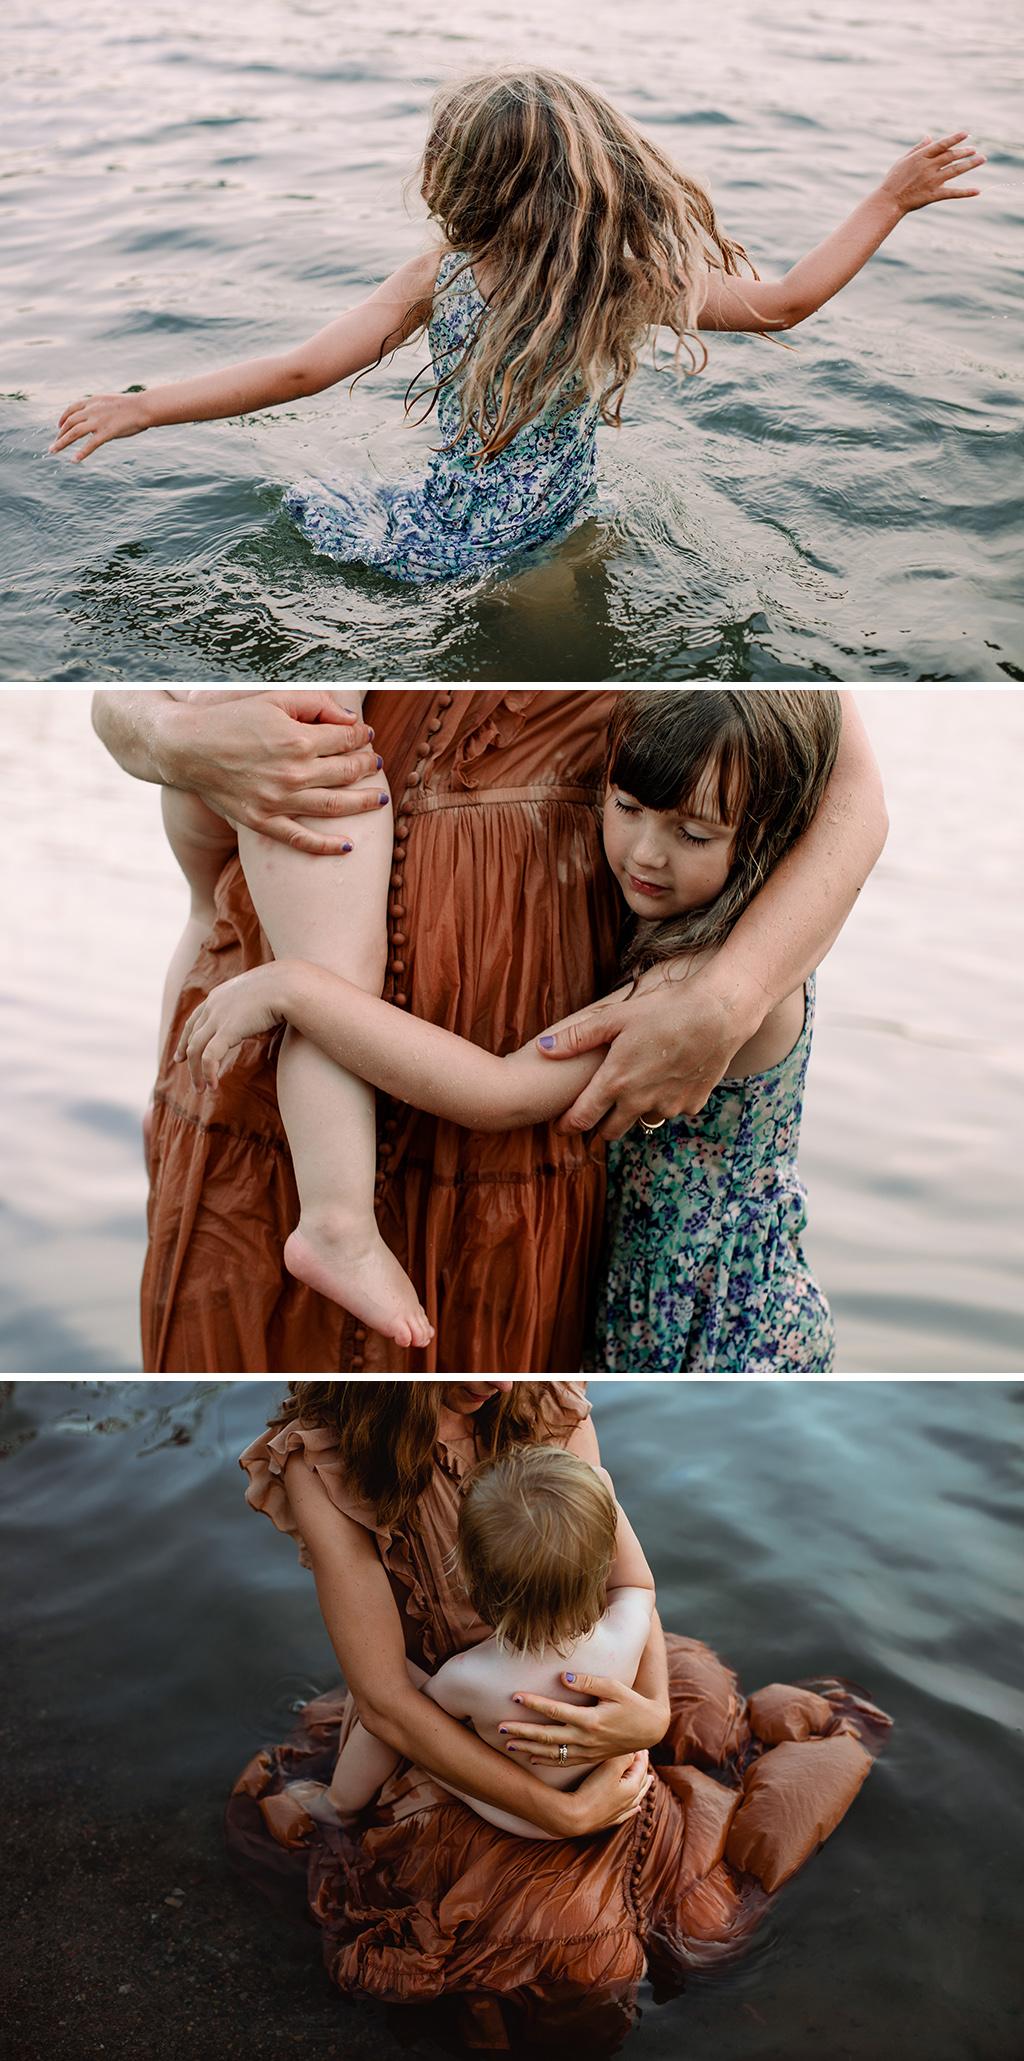 Hav-land_Fine-Art_Familjefotografering-i-vattnet_Stockholm-1.jpg